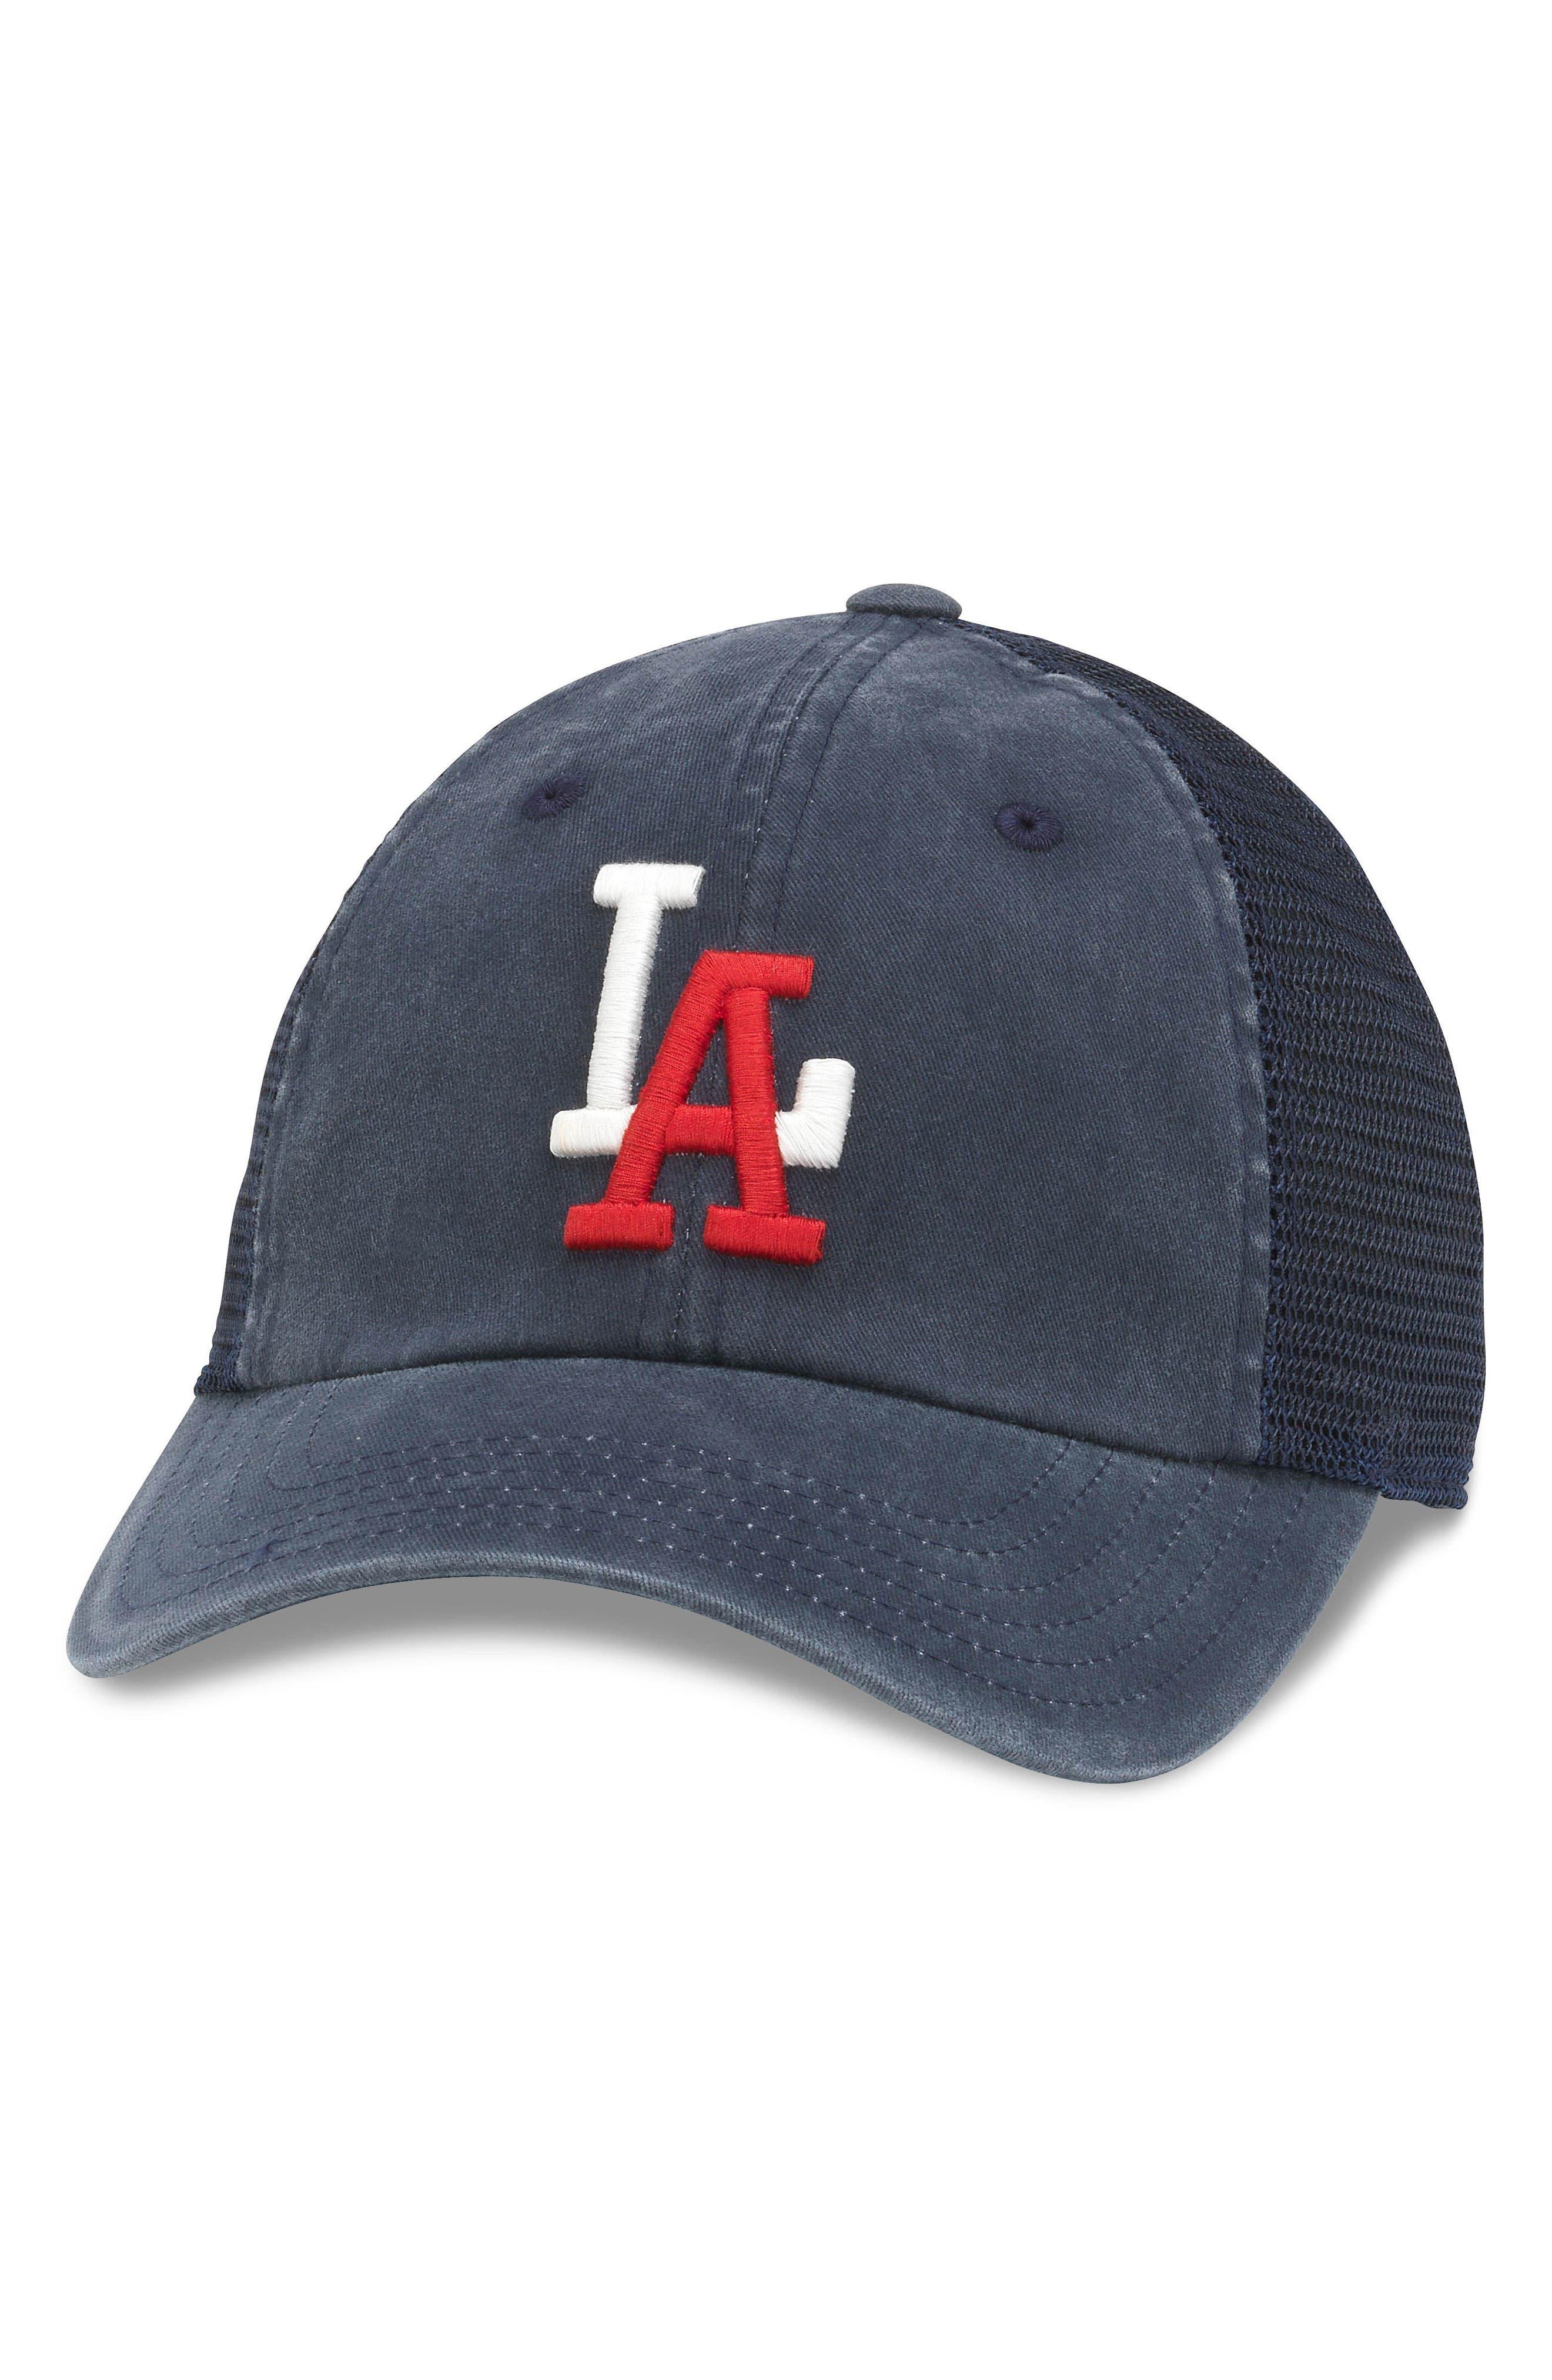 AMERICAN NEEDLE Raglan Bones MLB Baseball Cap